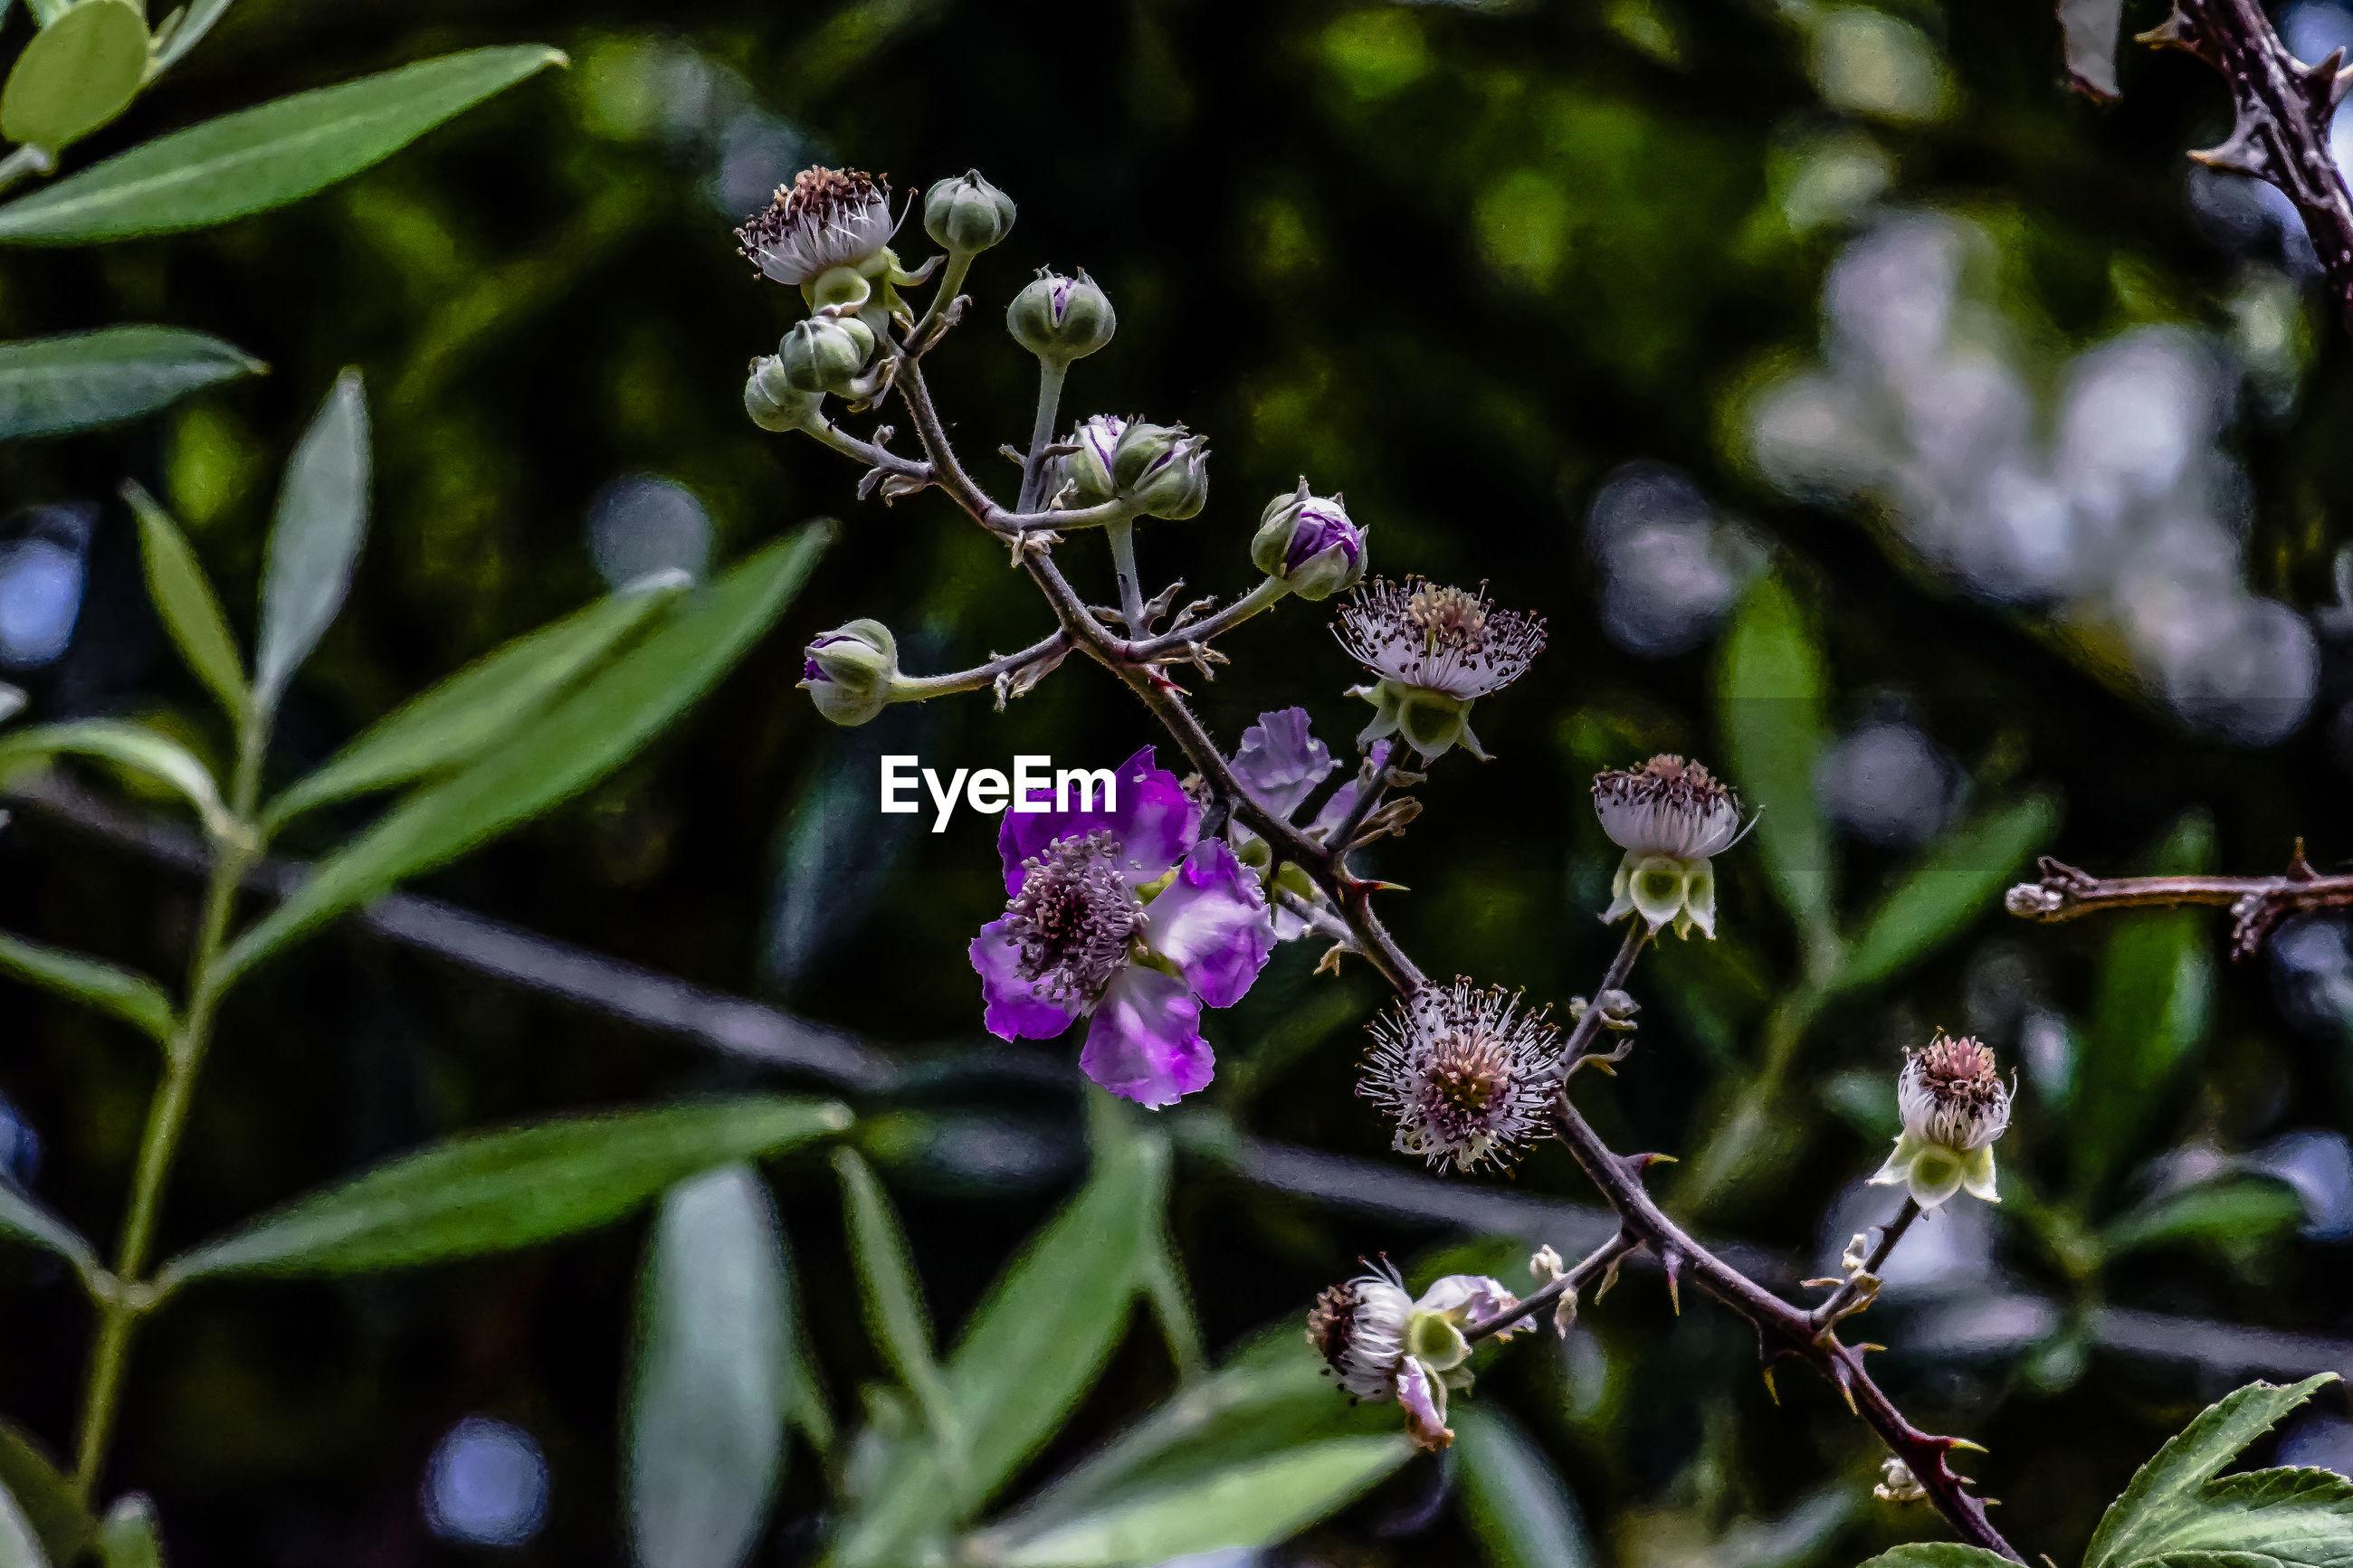 CLOSE-UP OF FRESH PURPLE FLOWERING PLANT